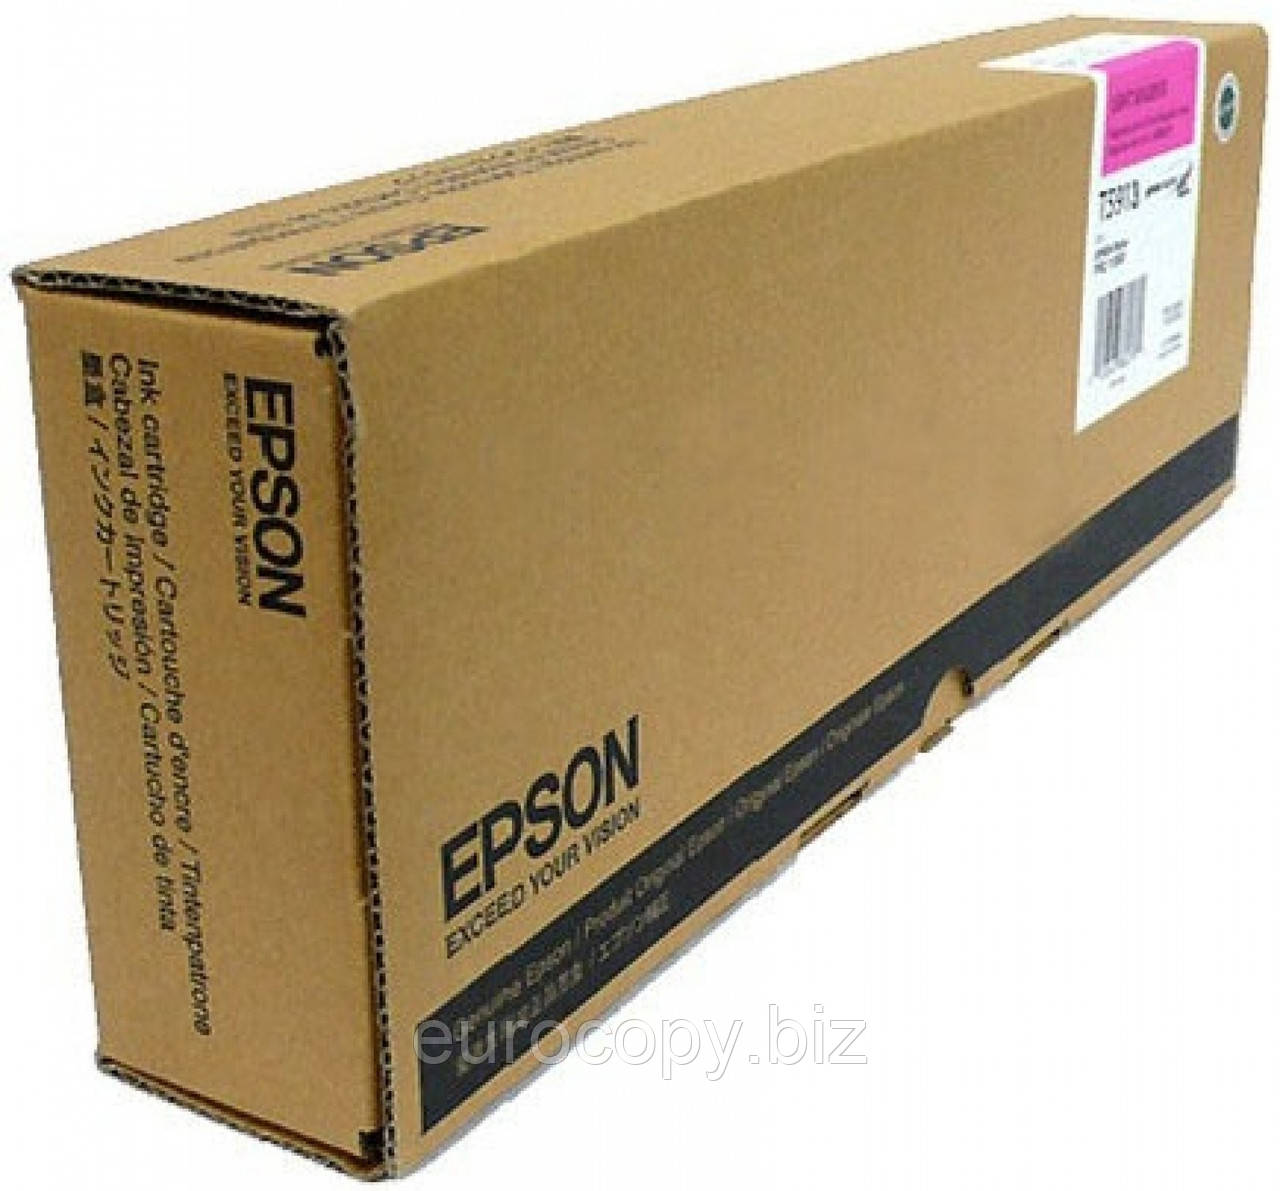 Картридж Epson StPro 11880 vivid magenta 700мл (C13T591300)